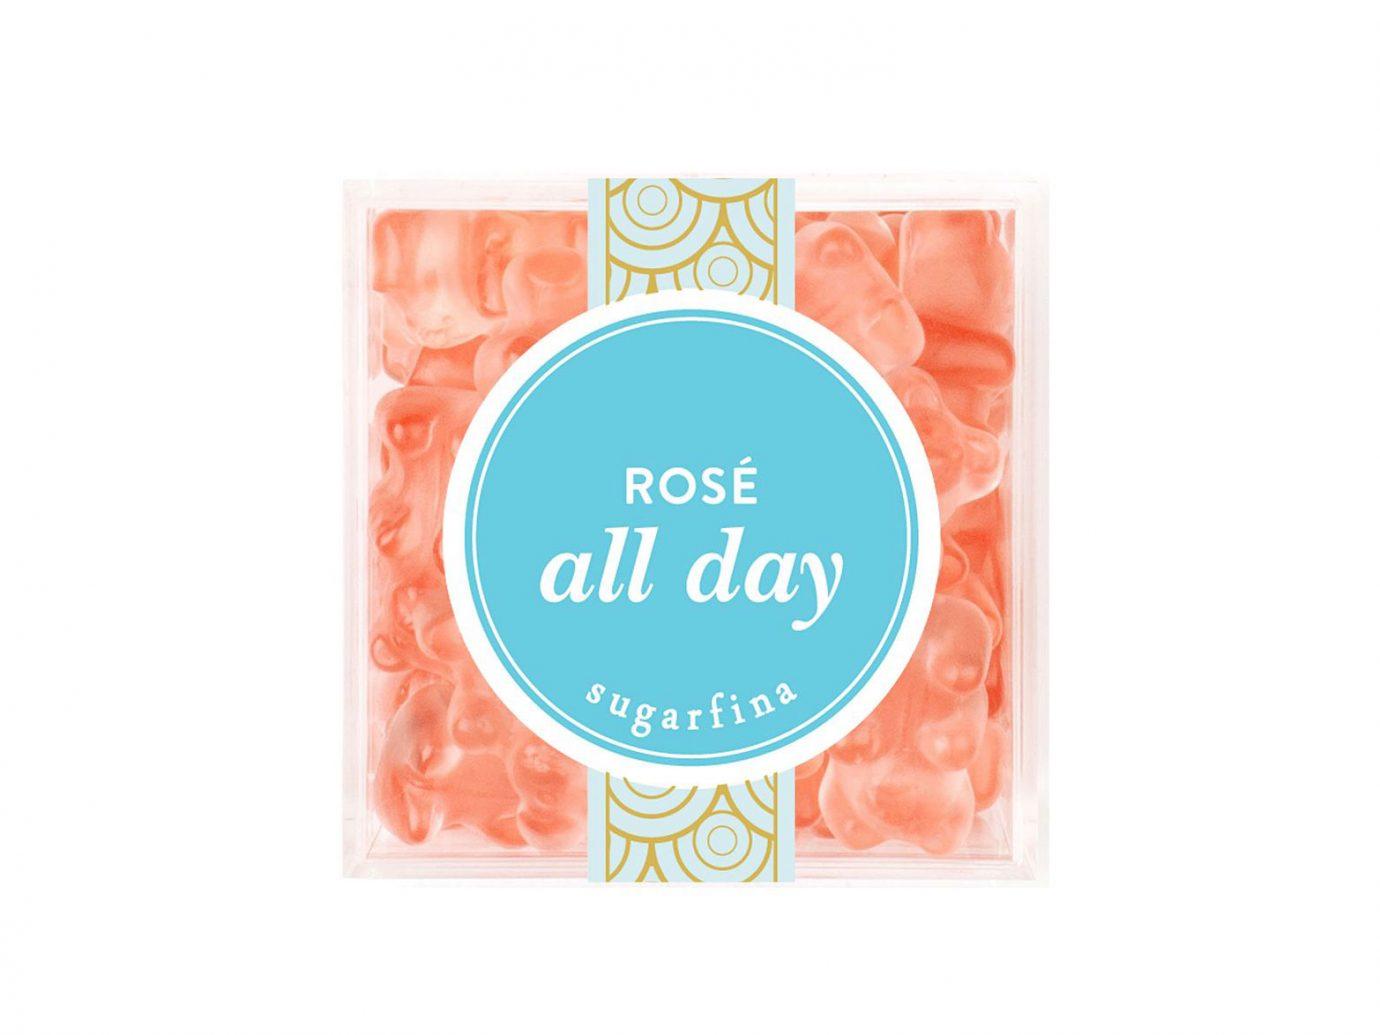 Sugarfina Rosé Infused Gummy Bear Gift Box